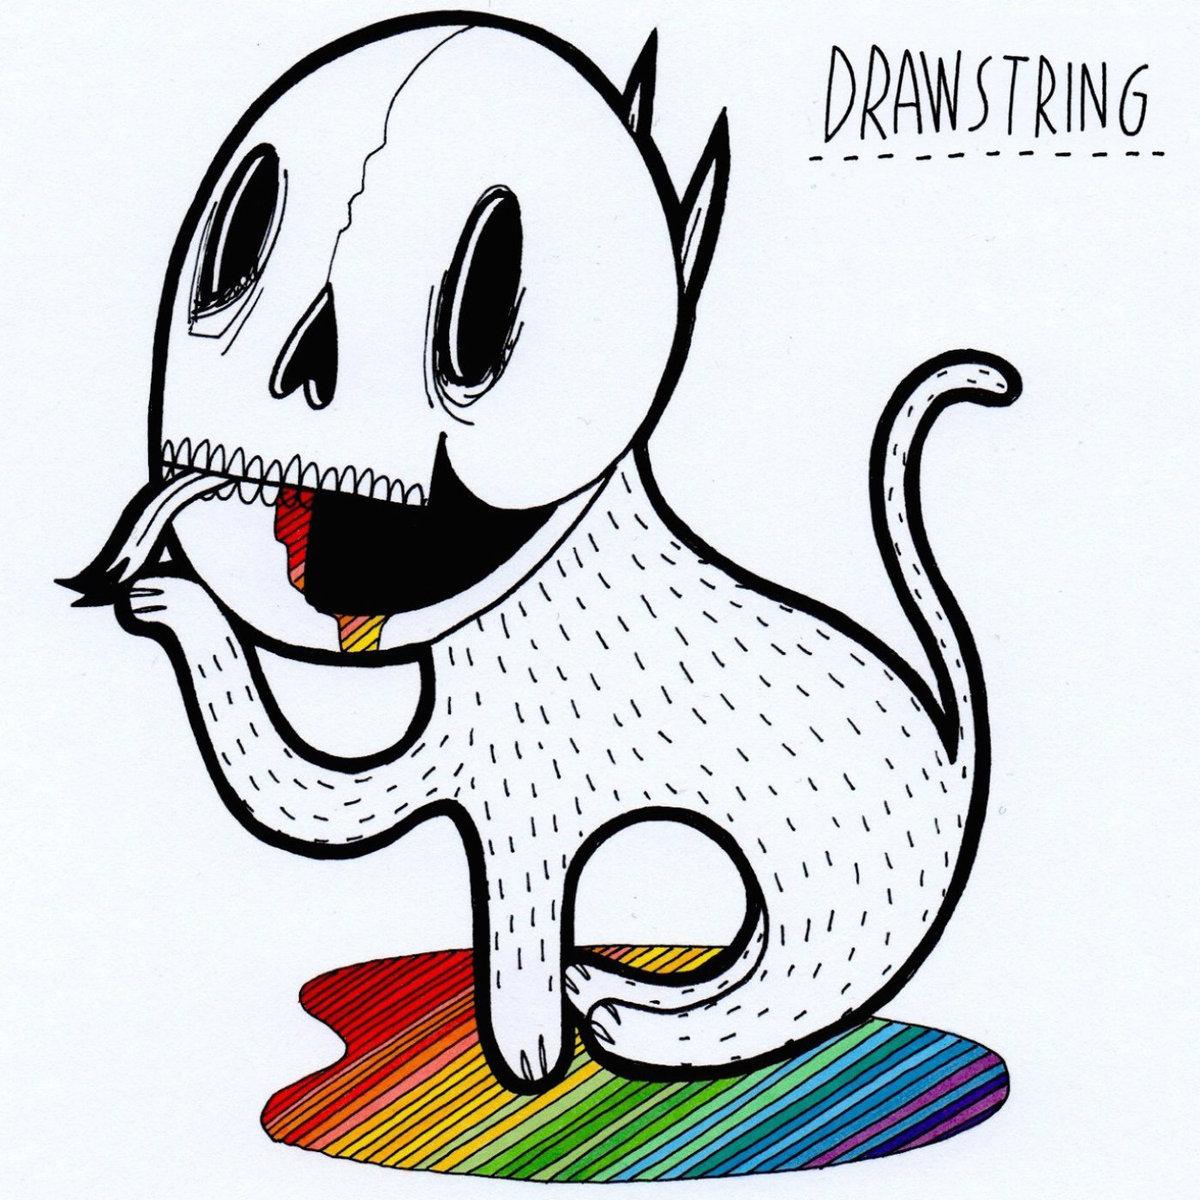 Drawstring - One